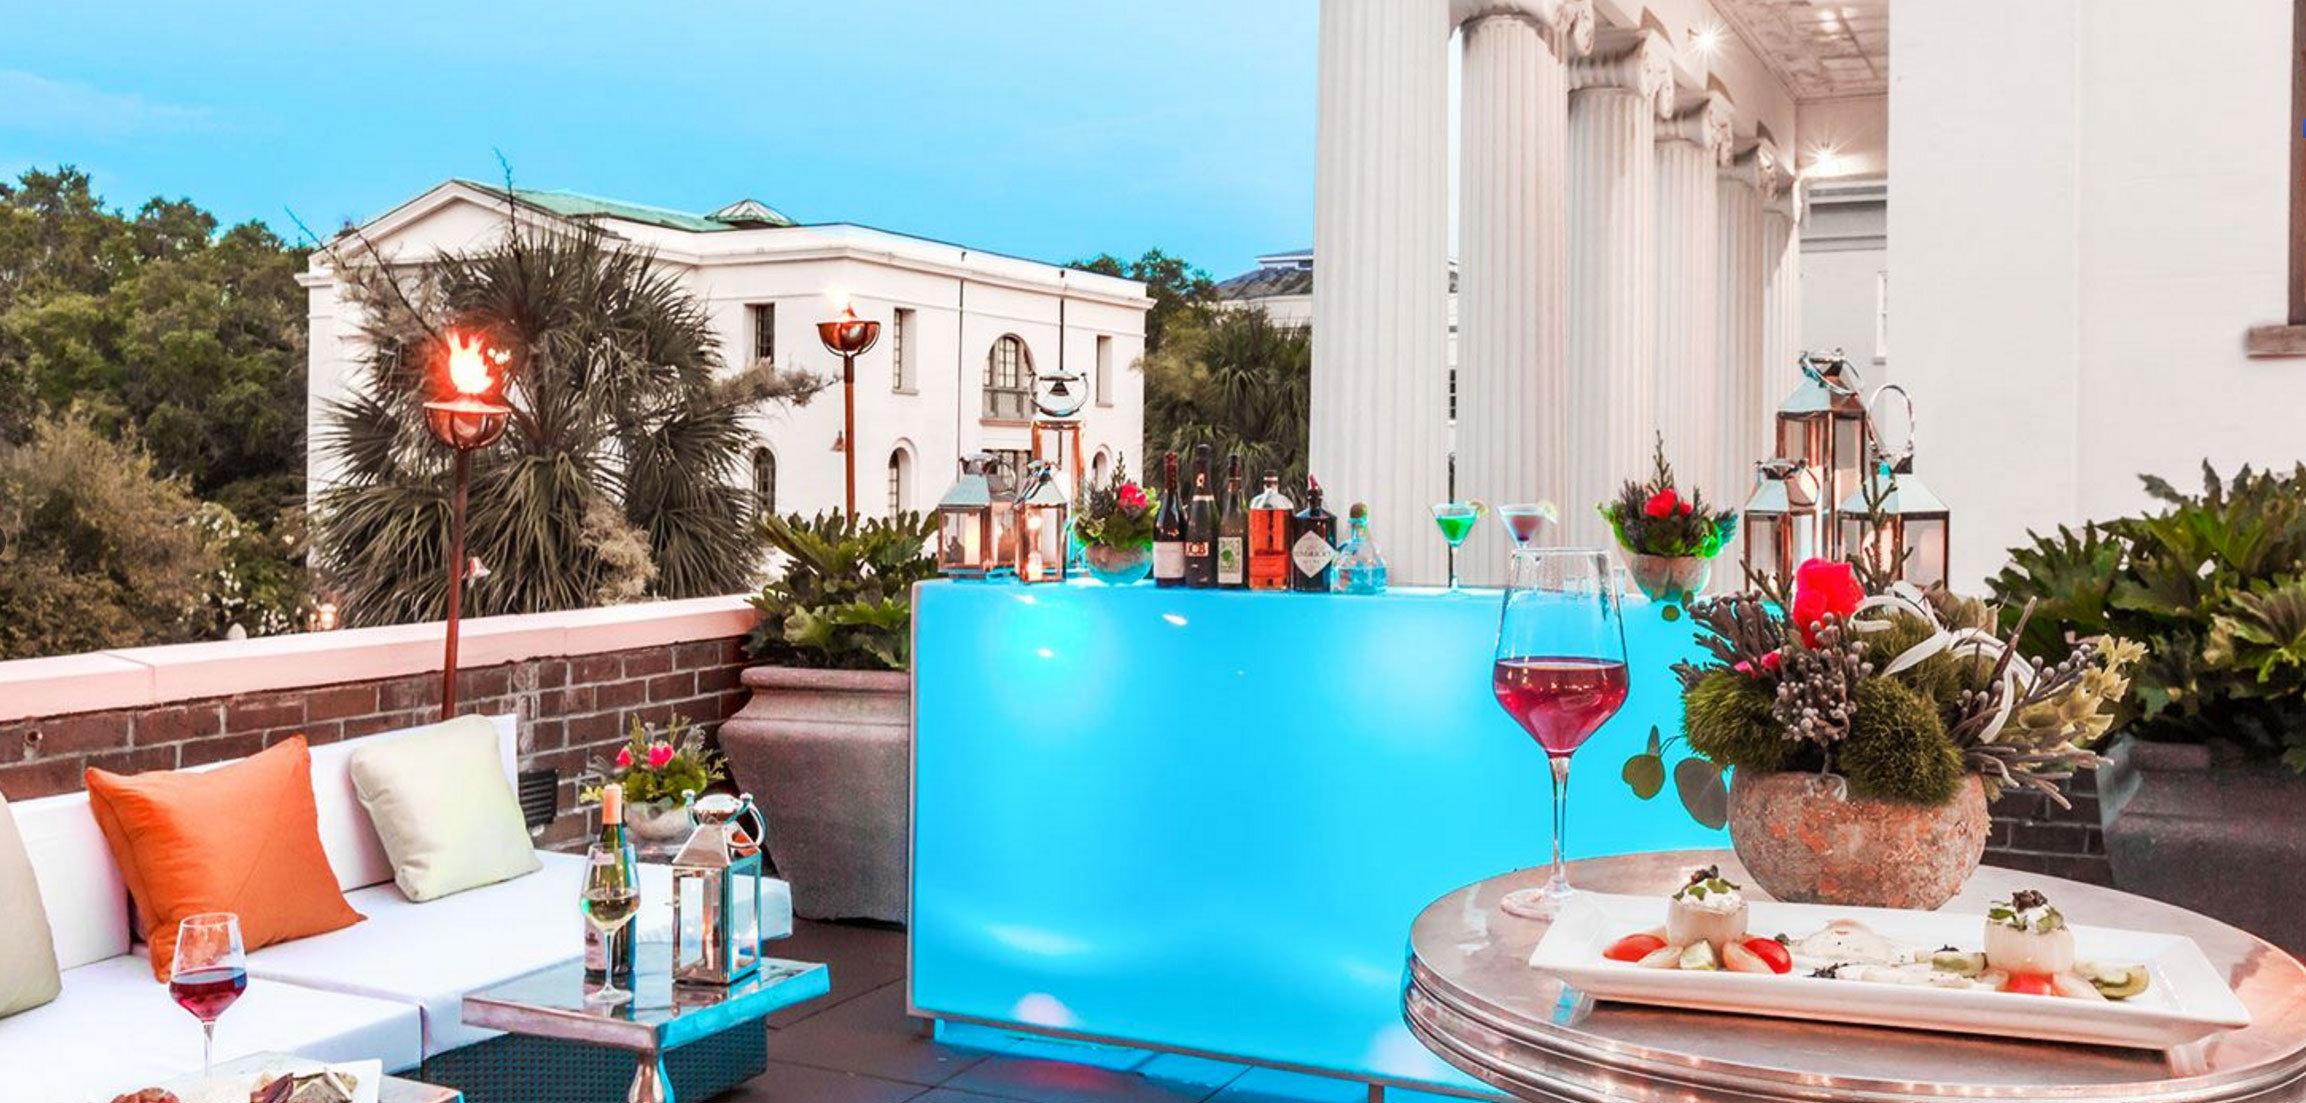 sky leisure restaurant Resort home Villa backyard